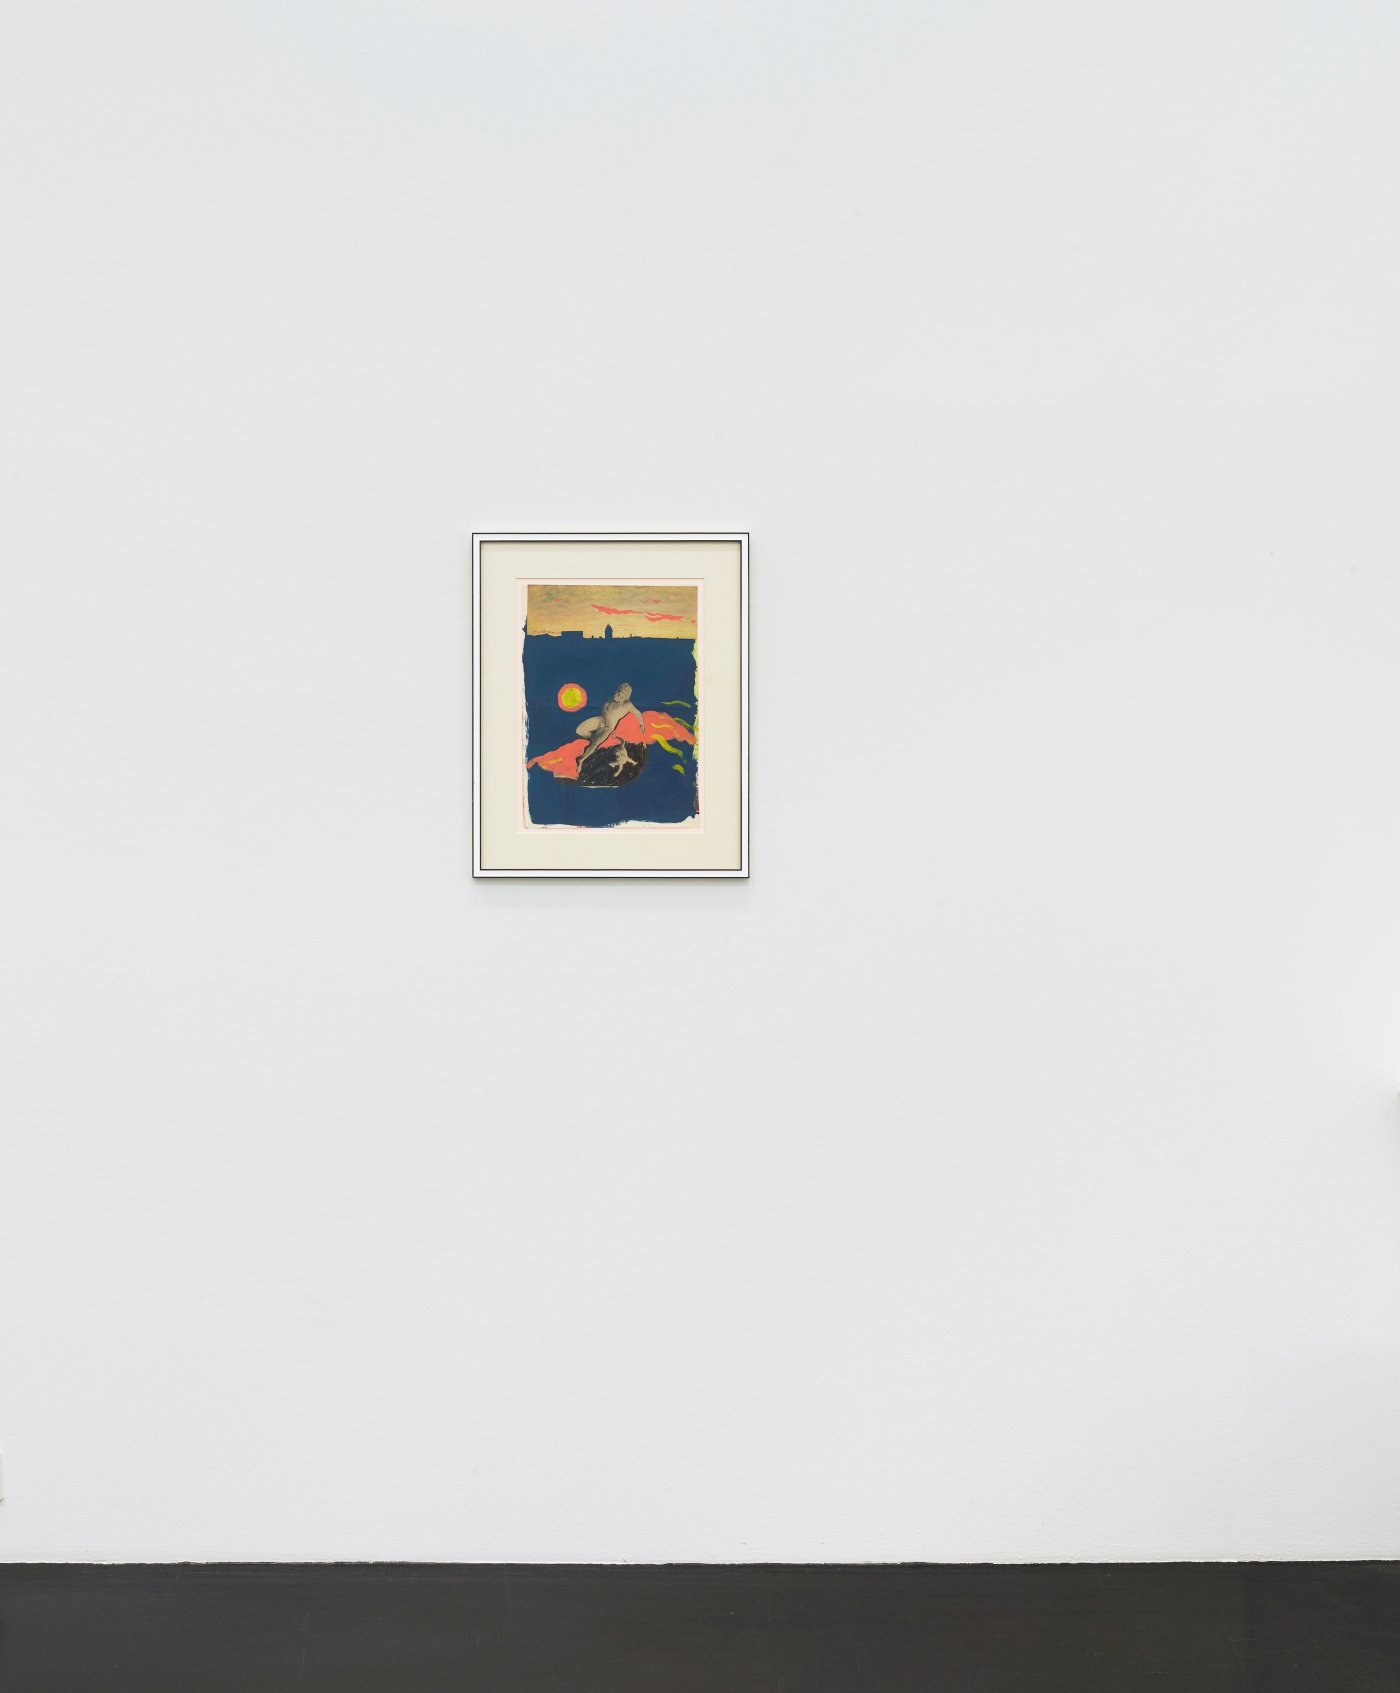 Galerie Buchholz Cologne Lukas Duwenhogger Katharina Wulff 9